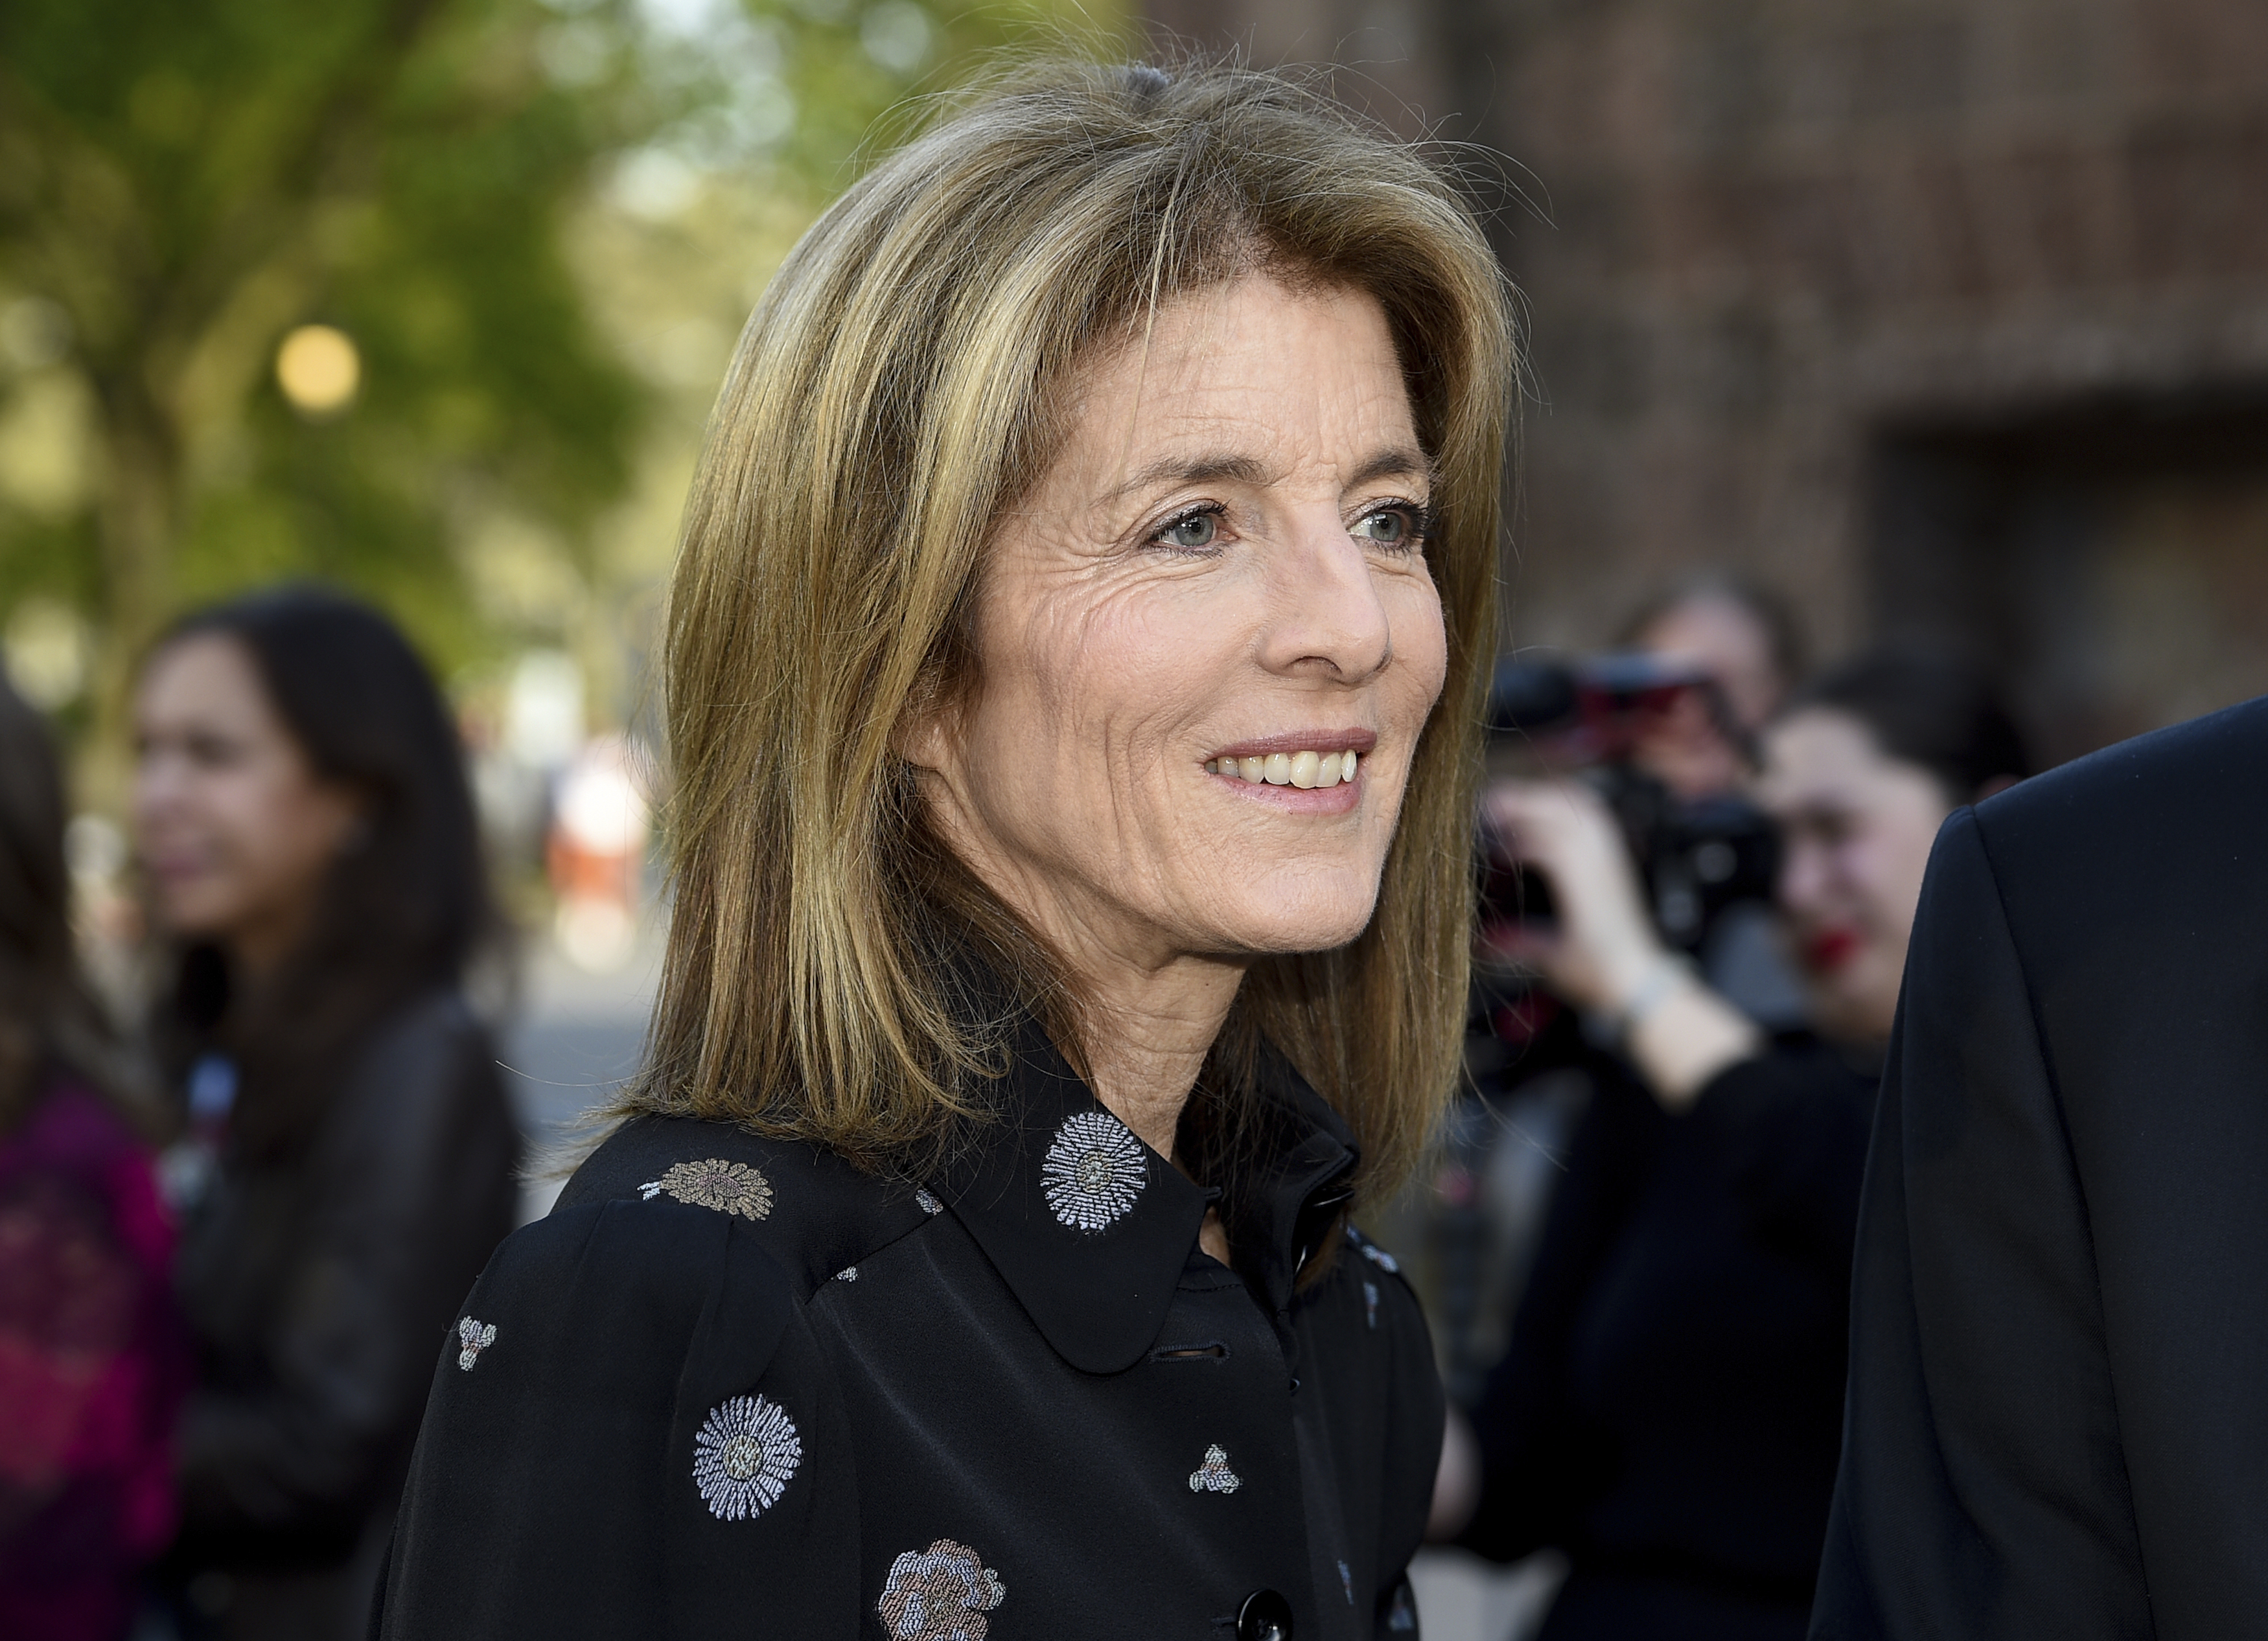 Caroline Kennedy Daughter Of Jfk Resigns From Post At Harvard